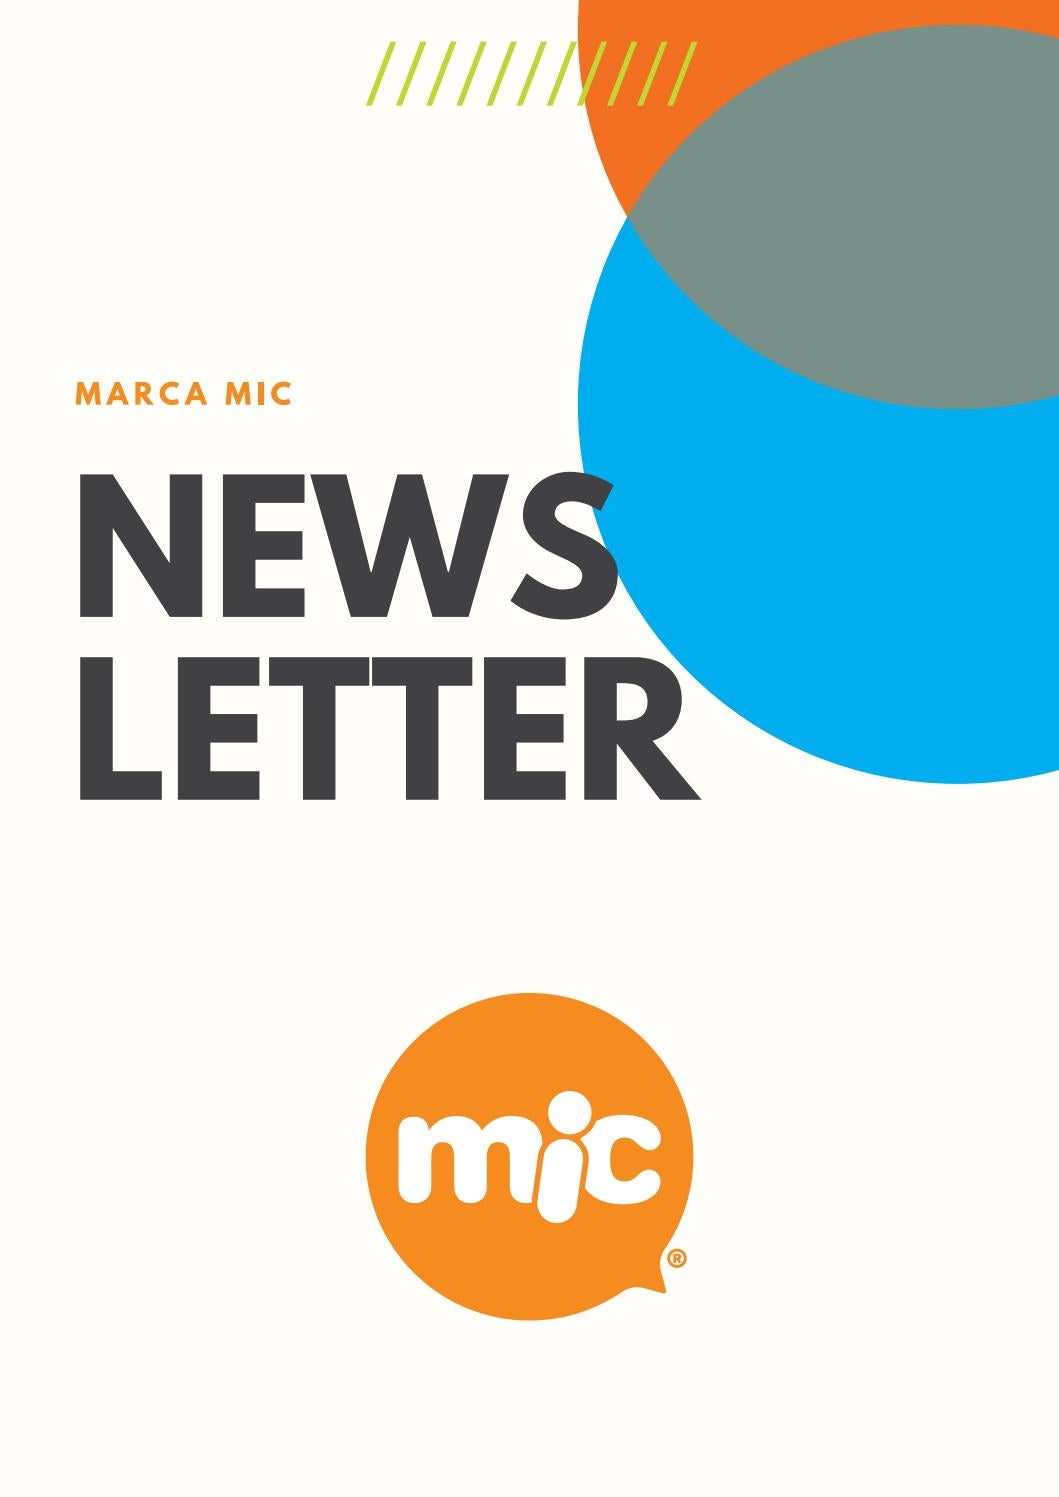 Newsletter mic by MIC Ponemos la Fantasía - issuu a93137be4566c